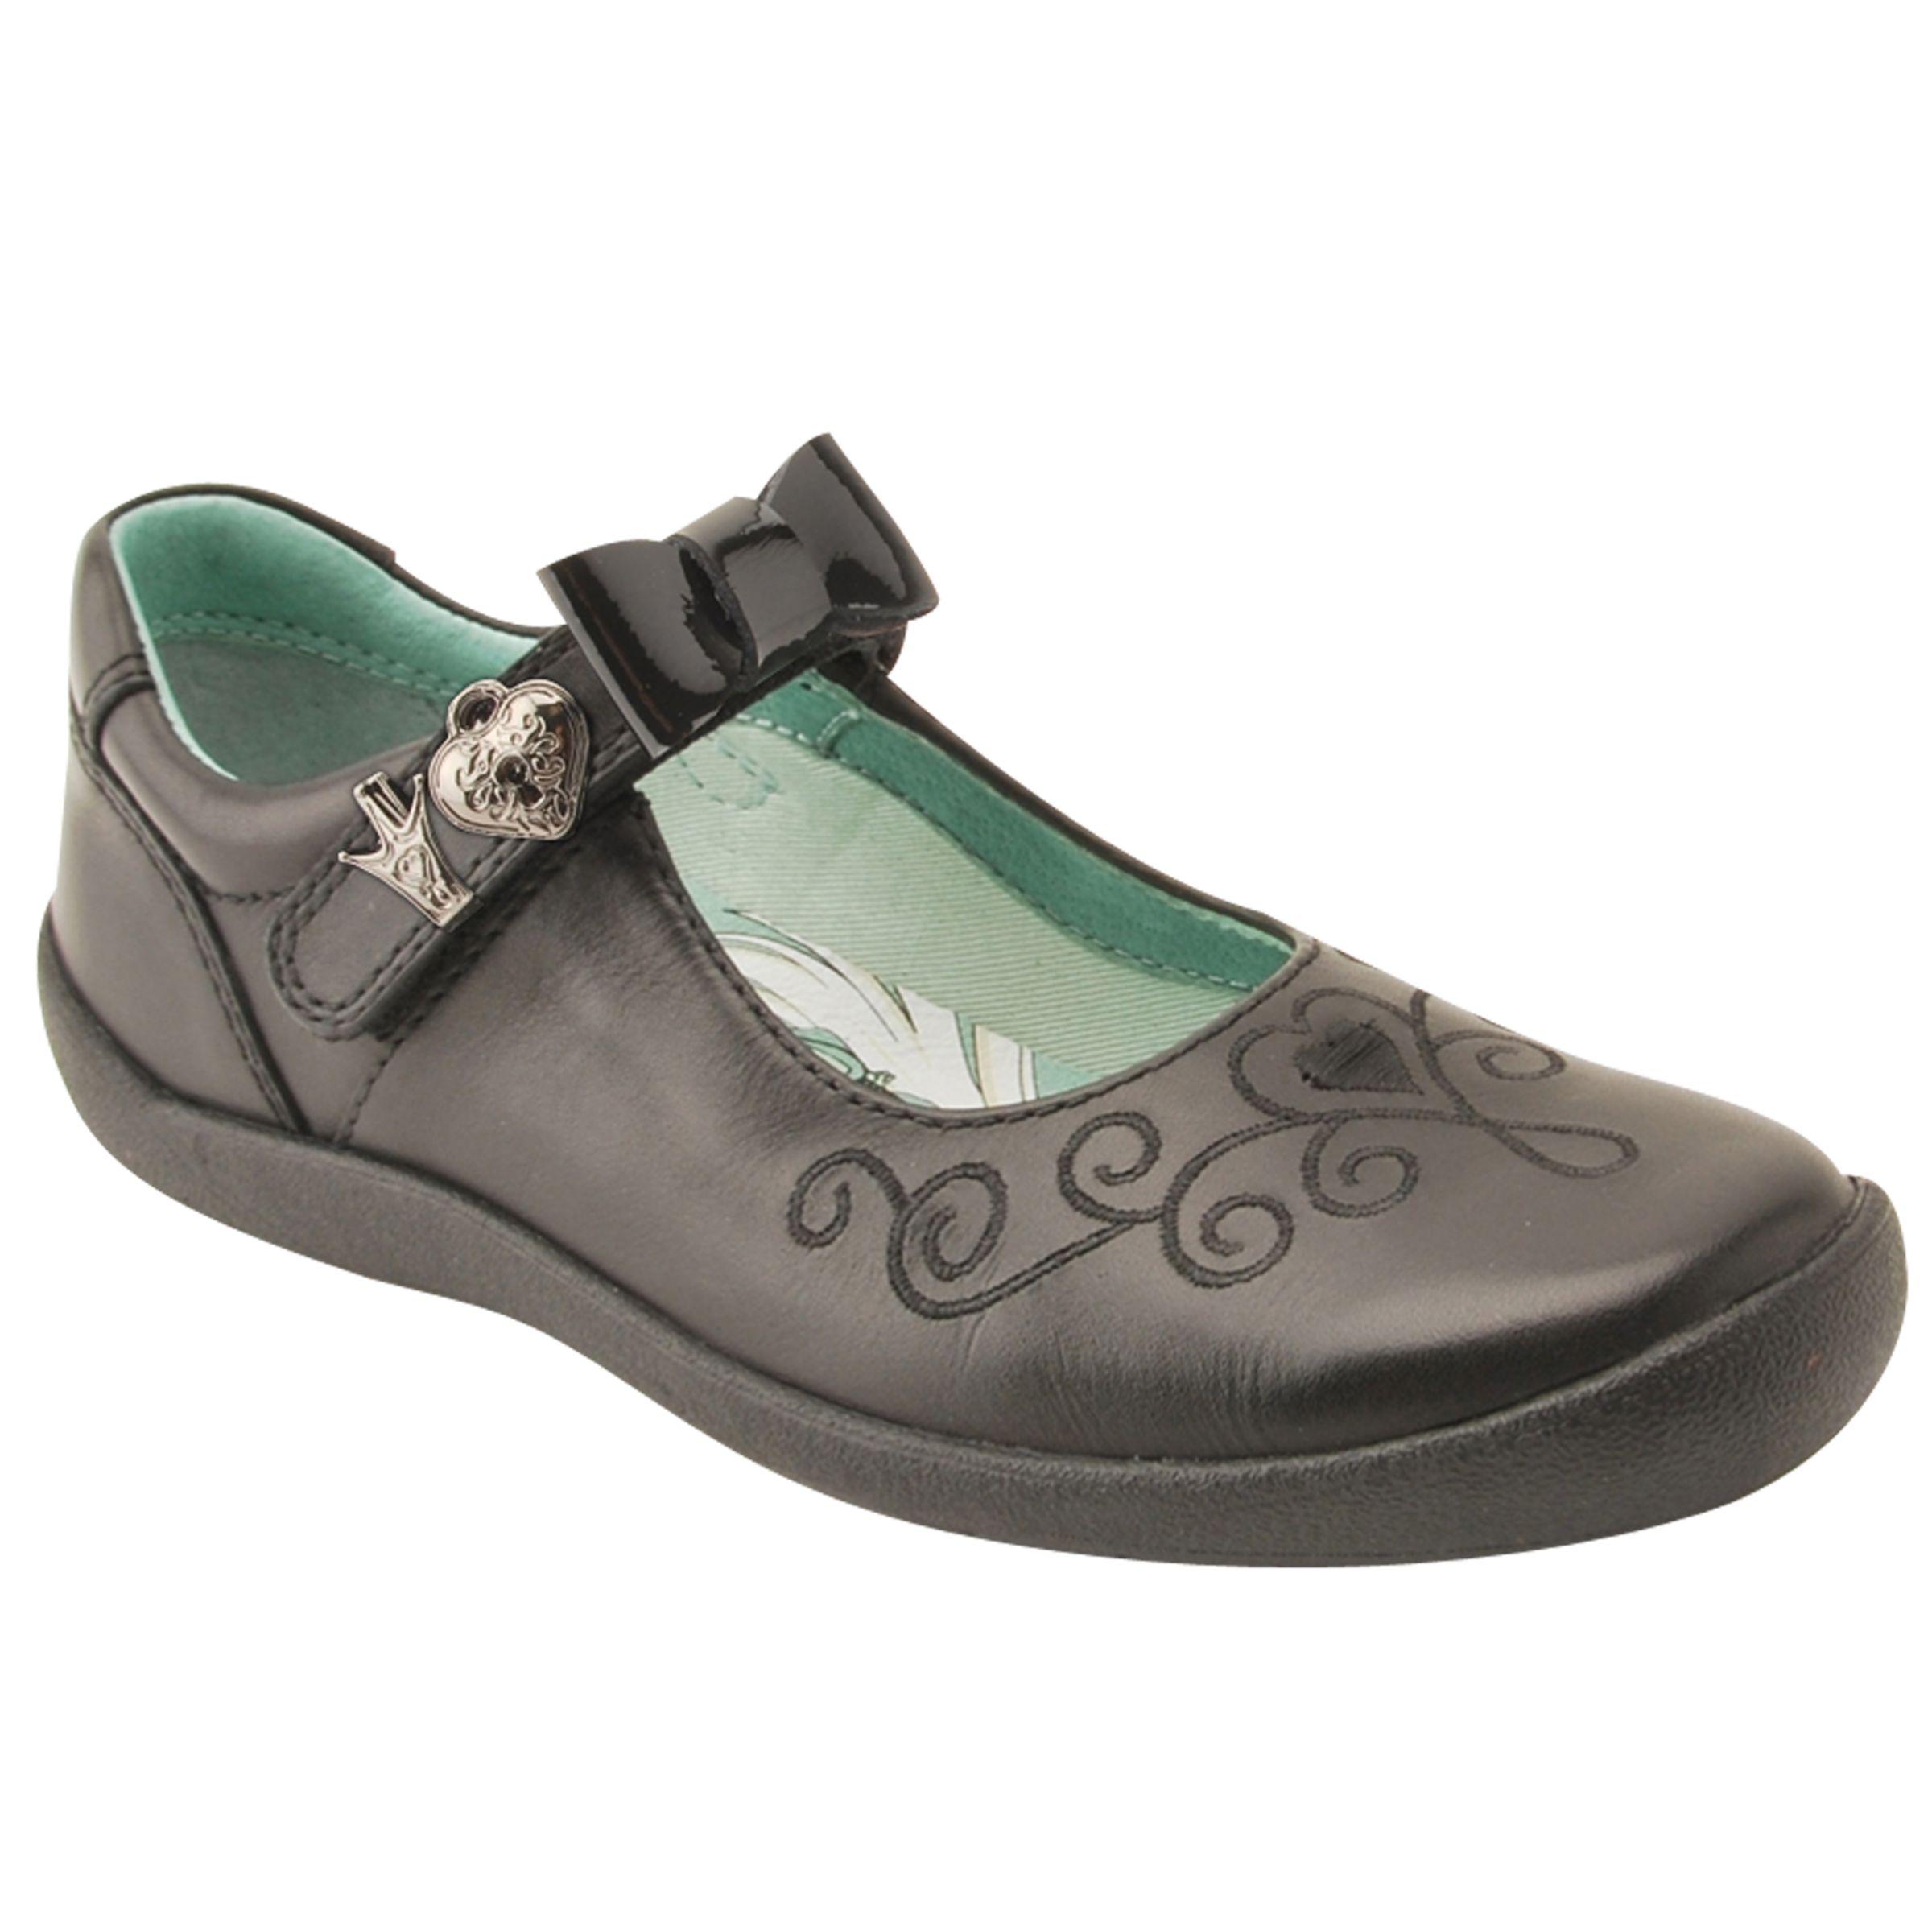 Start-Rite Start-rite Infant Princess Elza Mary Jane School Shoes, Black